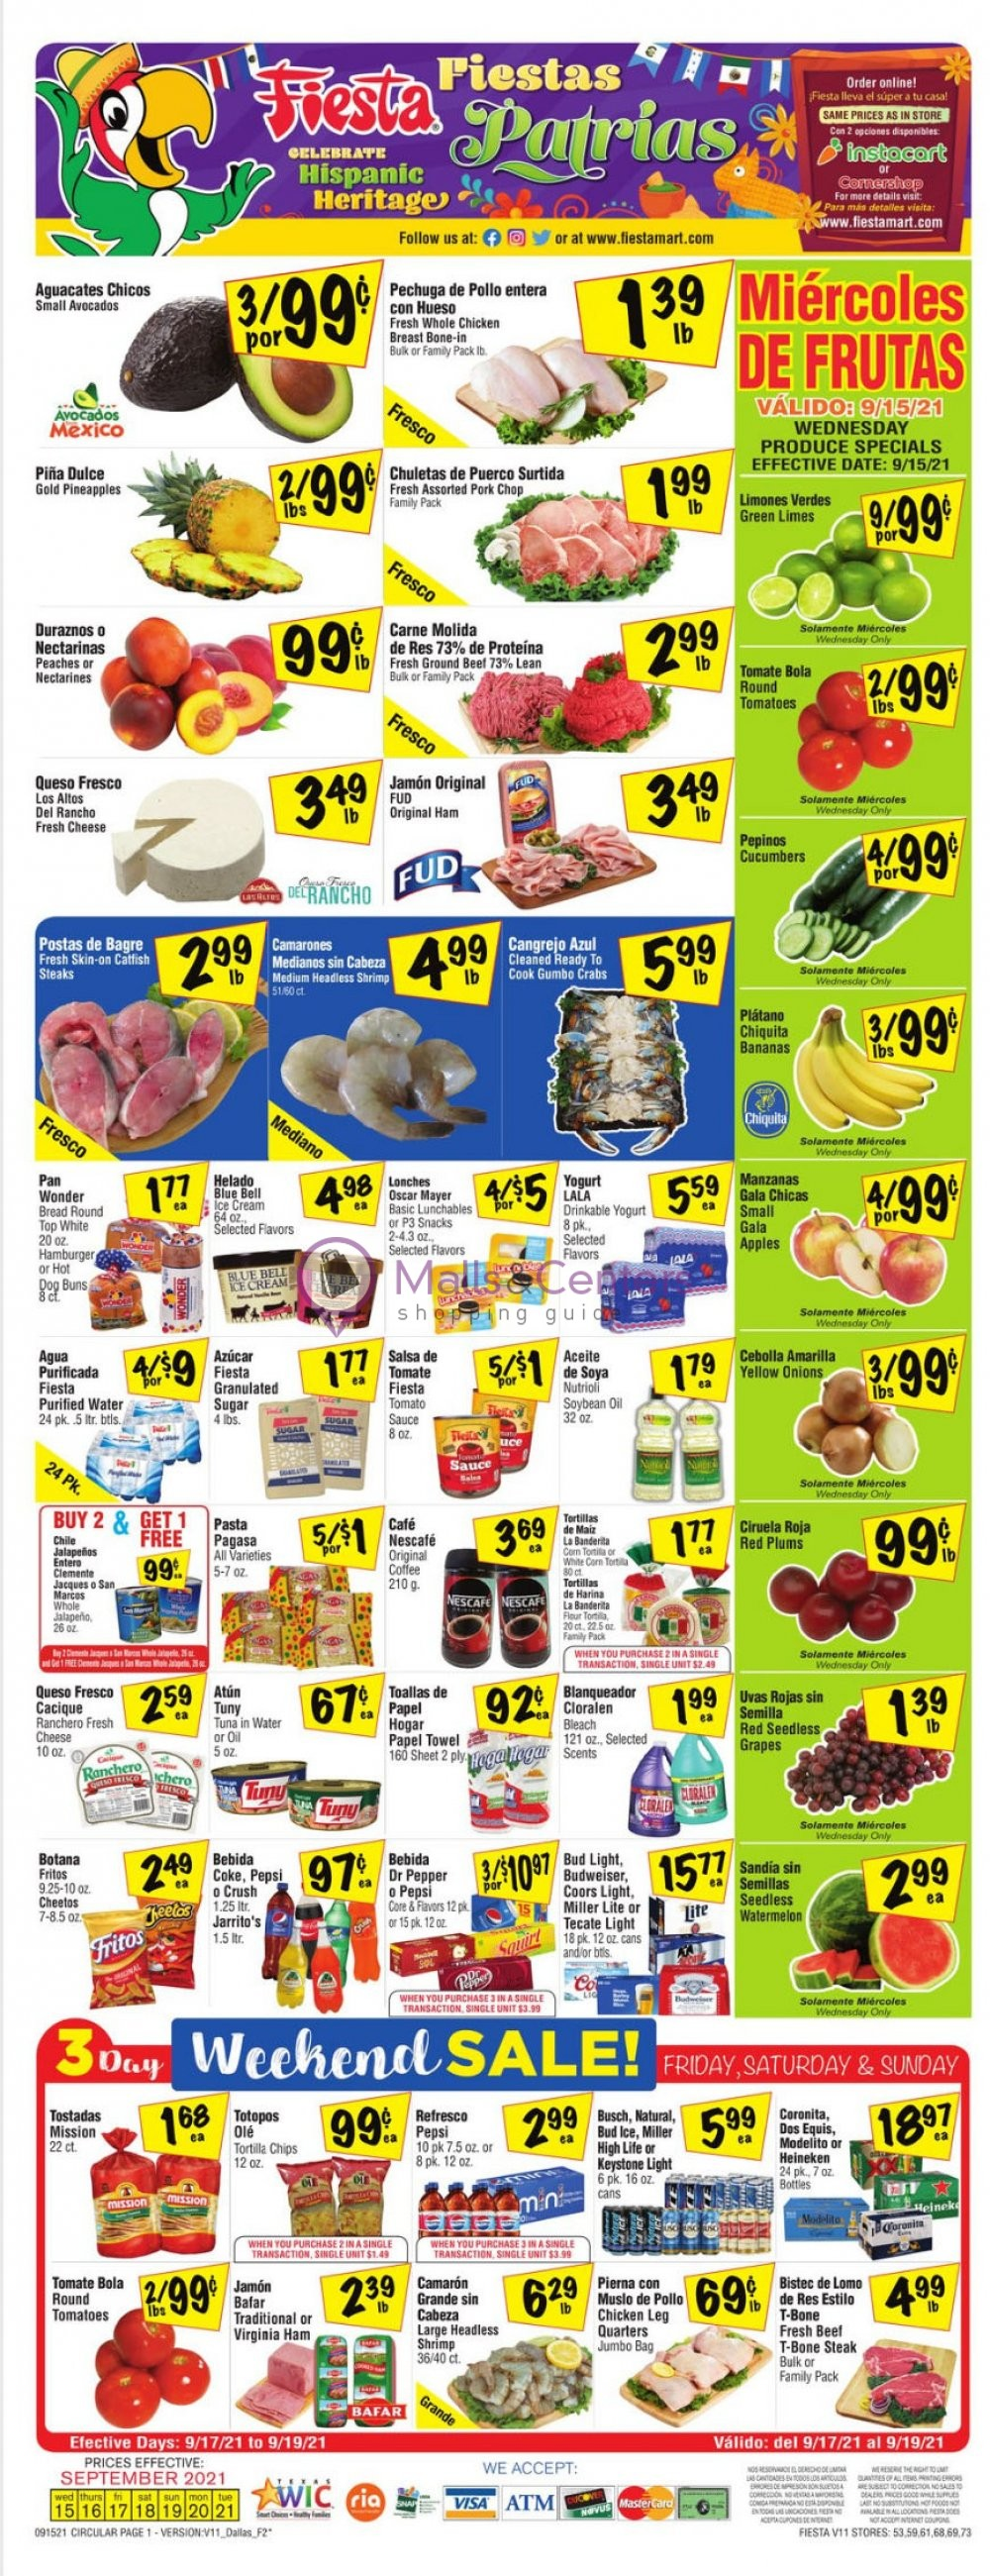 weekly ads Fiesta Mart - page 1 - mallscenters.com